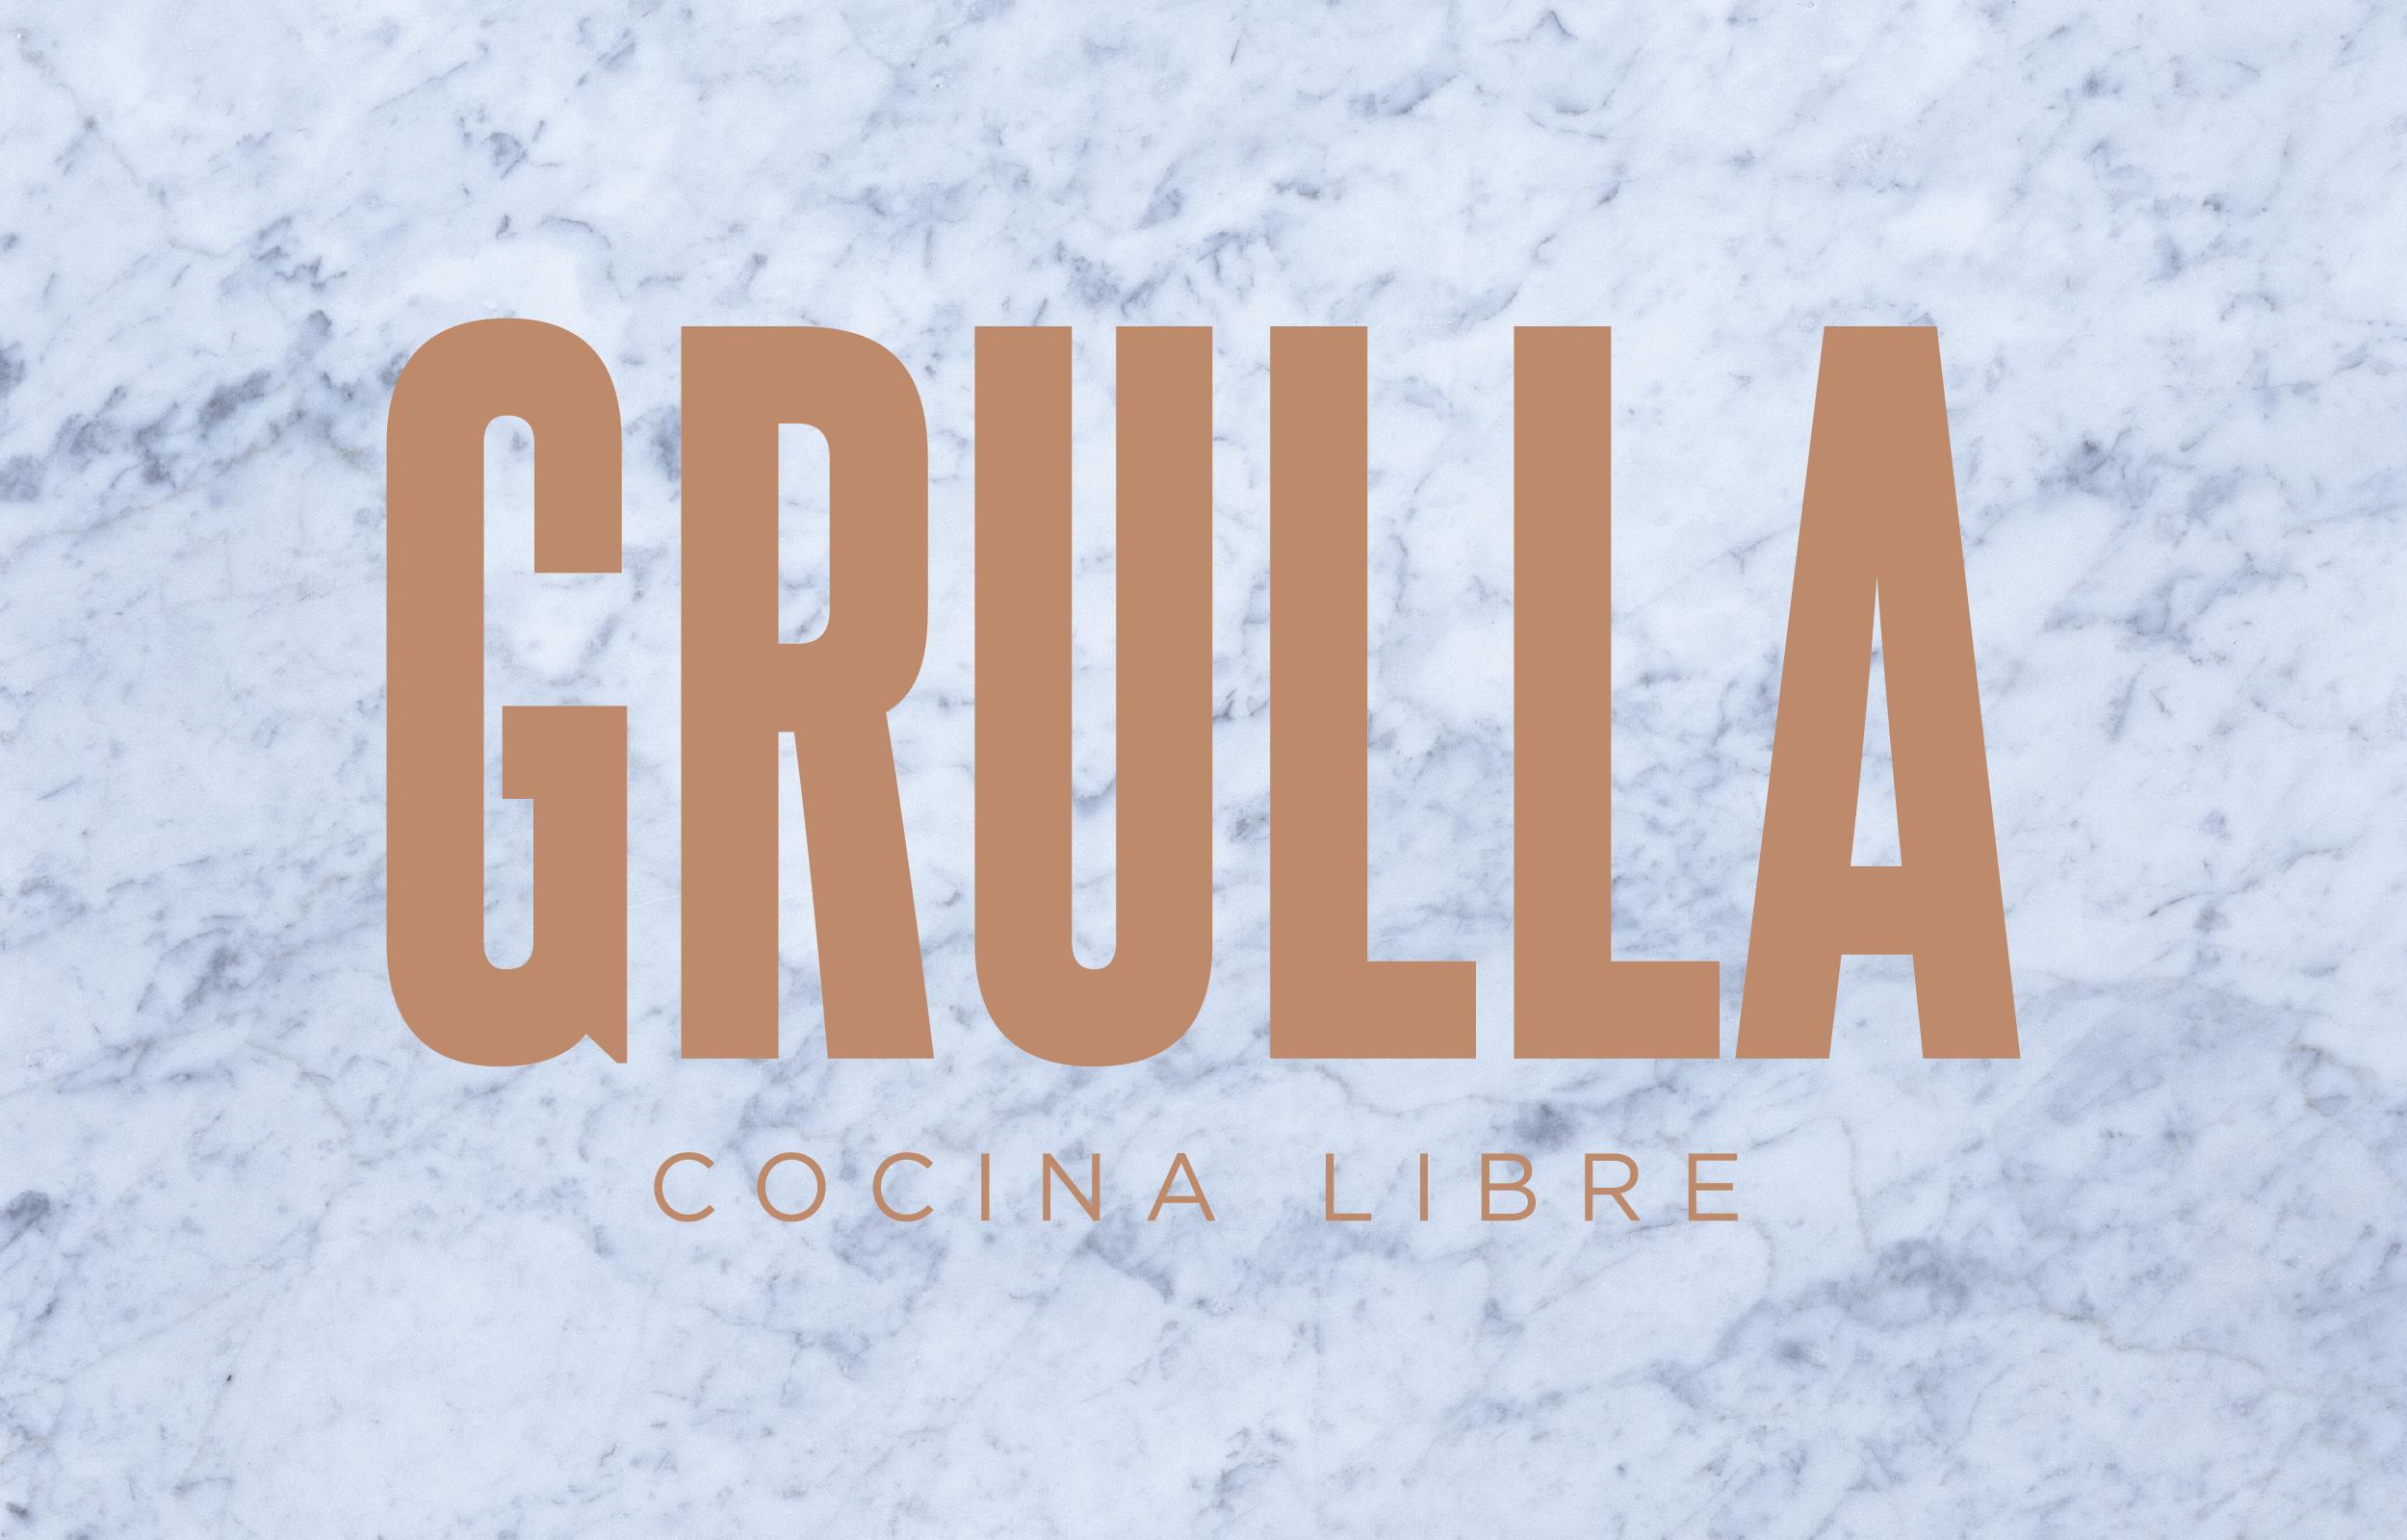 Grulla+Portafolio-01.png